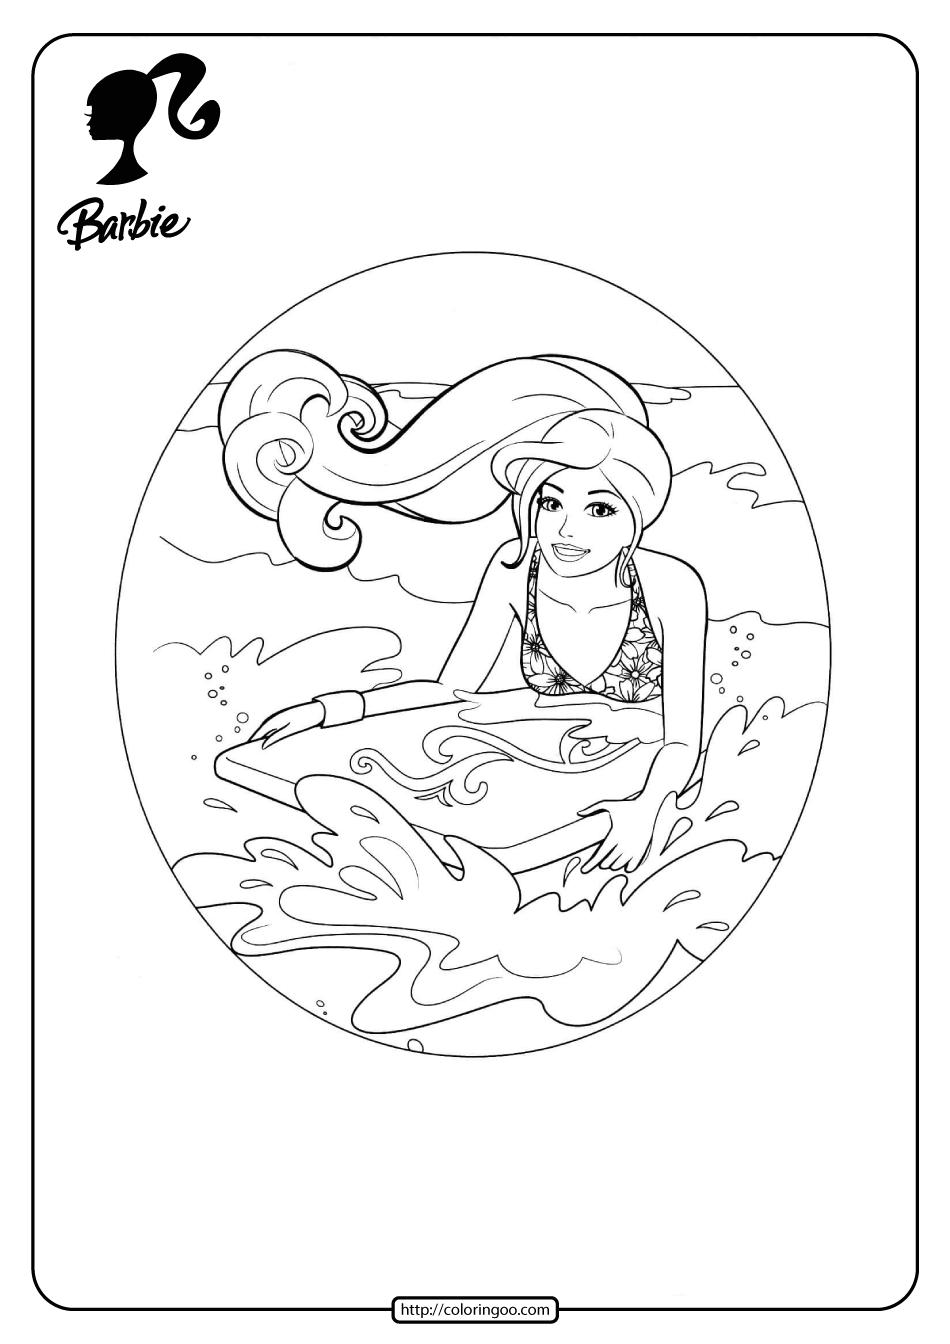 Free Printable Barbie Surfing Pdf Coloring Pages 11 Barbie Coloring Pages Coloring Pages Barbie Coloring